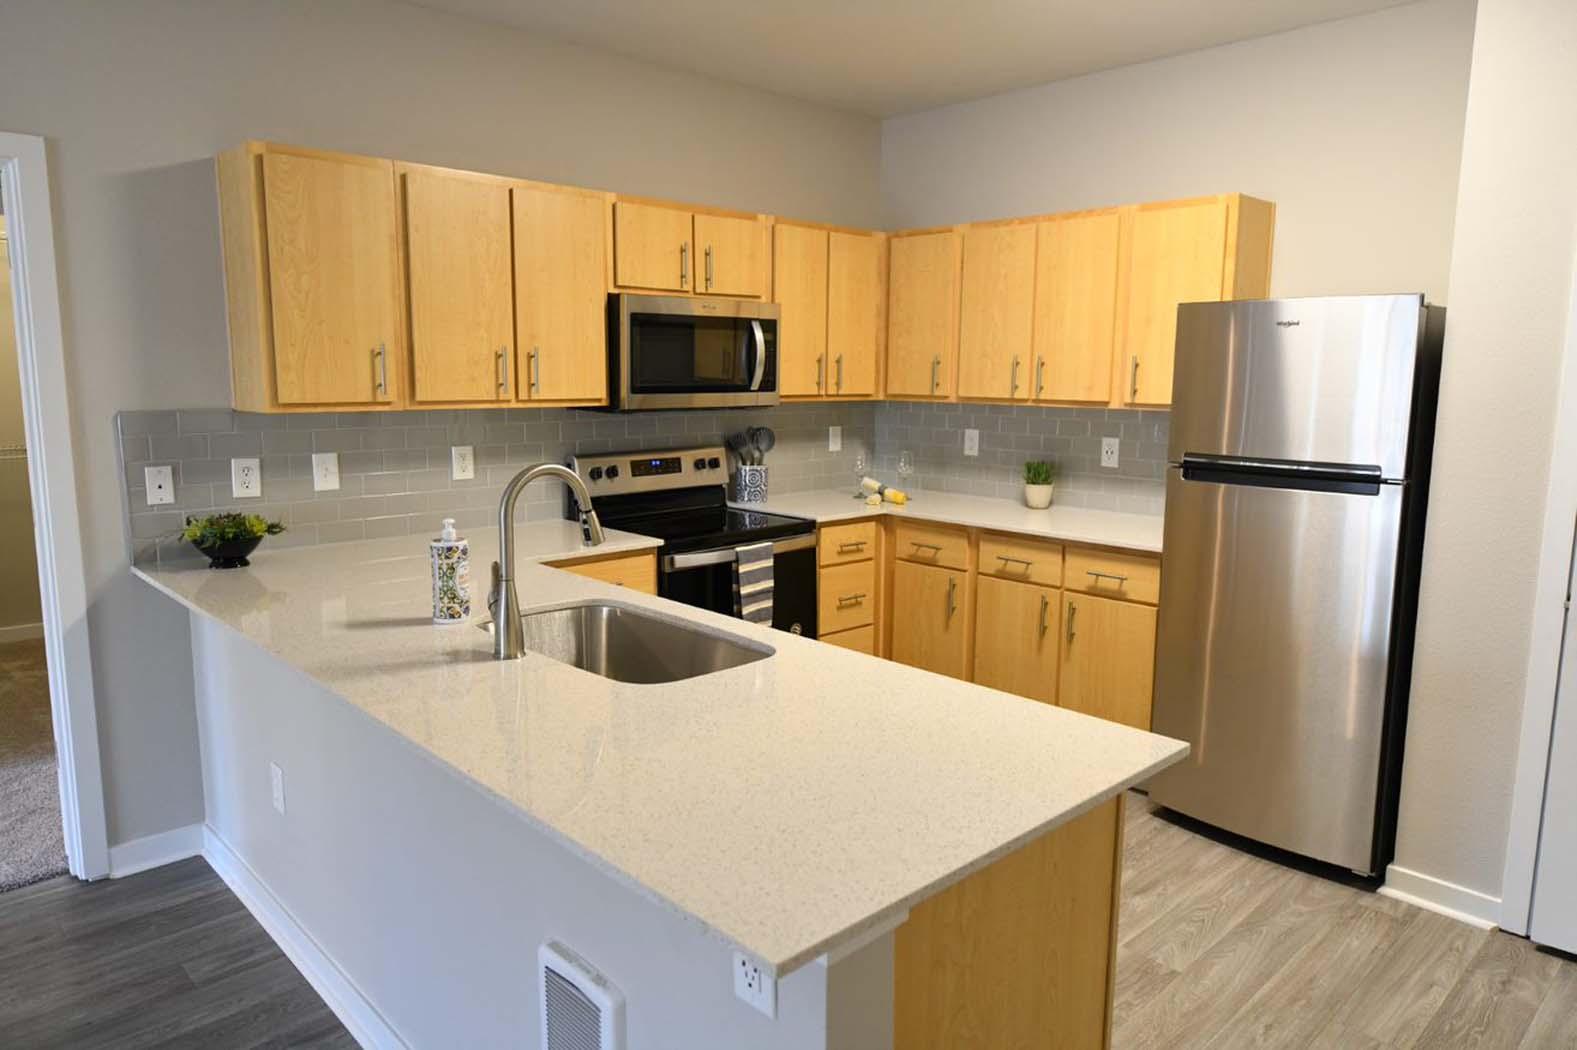 Granite Countertop Kitchen at Domaine at Villebois Apartment Homes, Oregon